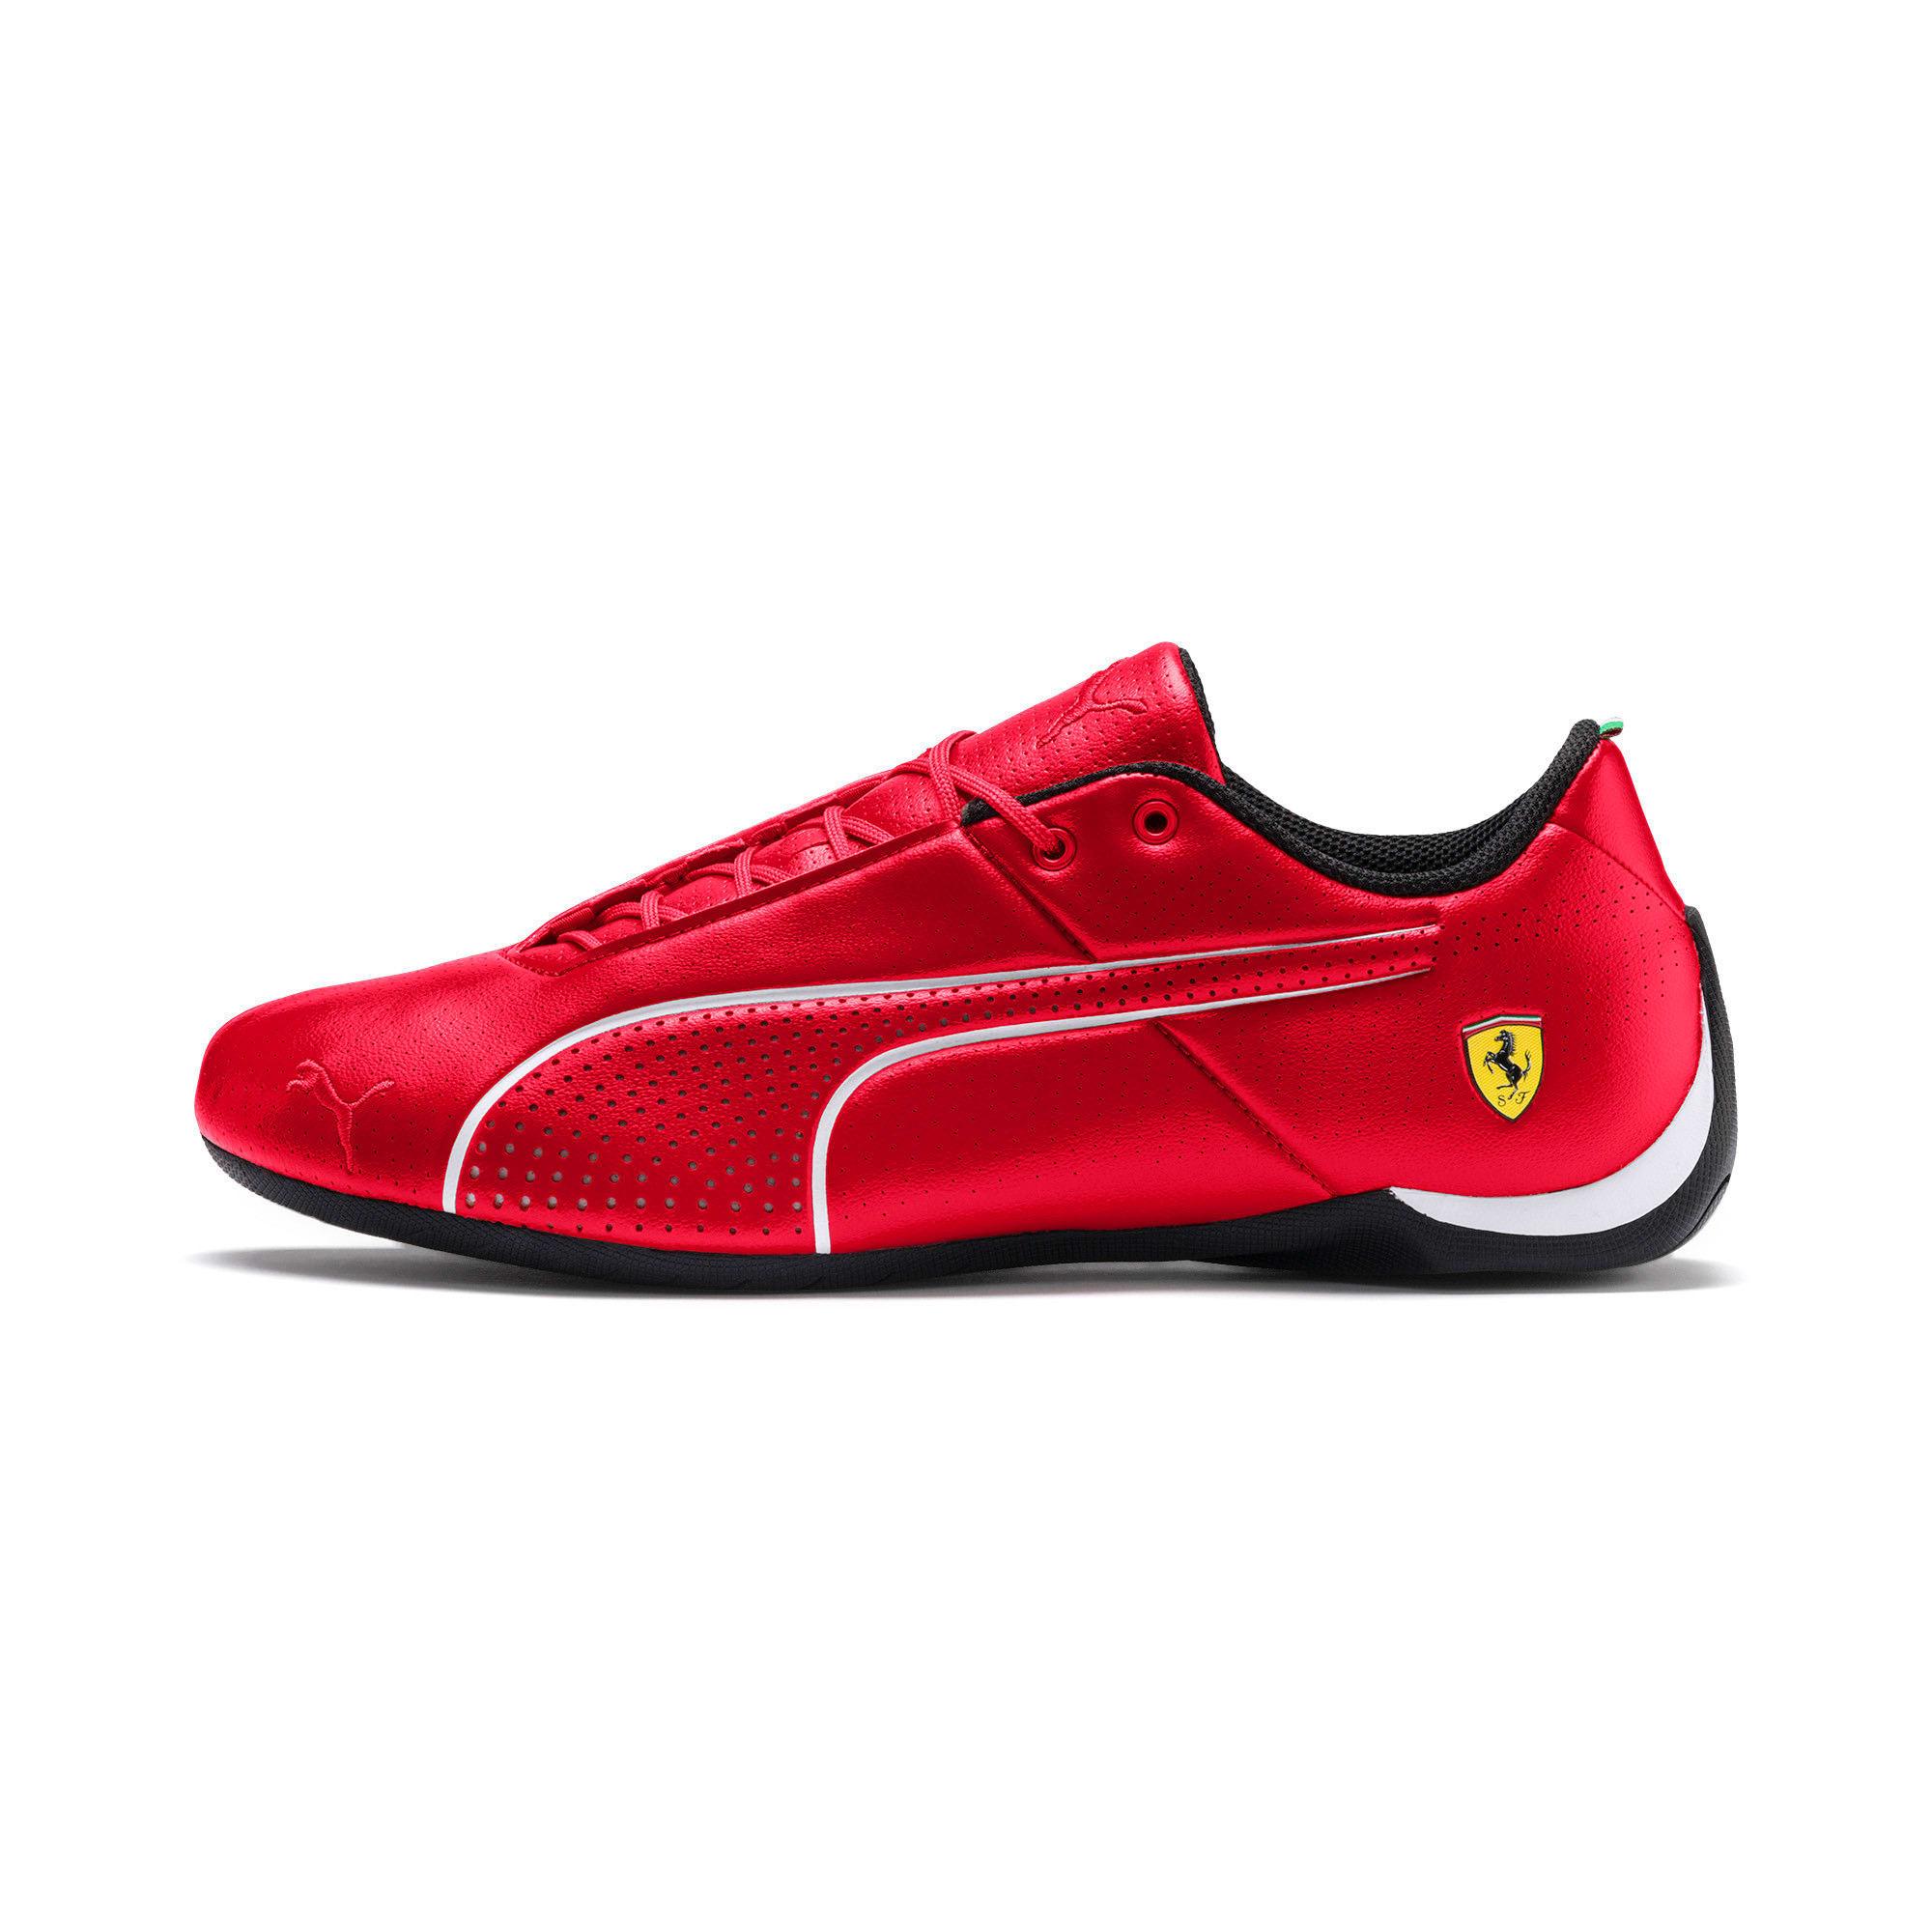 Thumbnail 1 of Ferrari Future Cat Ultra Trainers, Rosso Corsa-Puma White, medium-IND